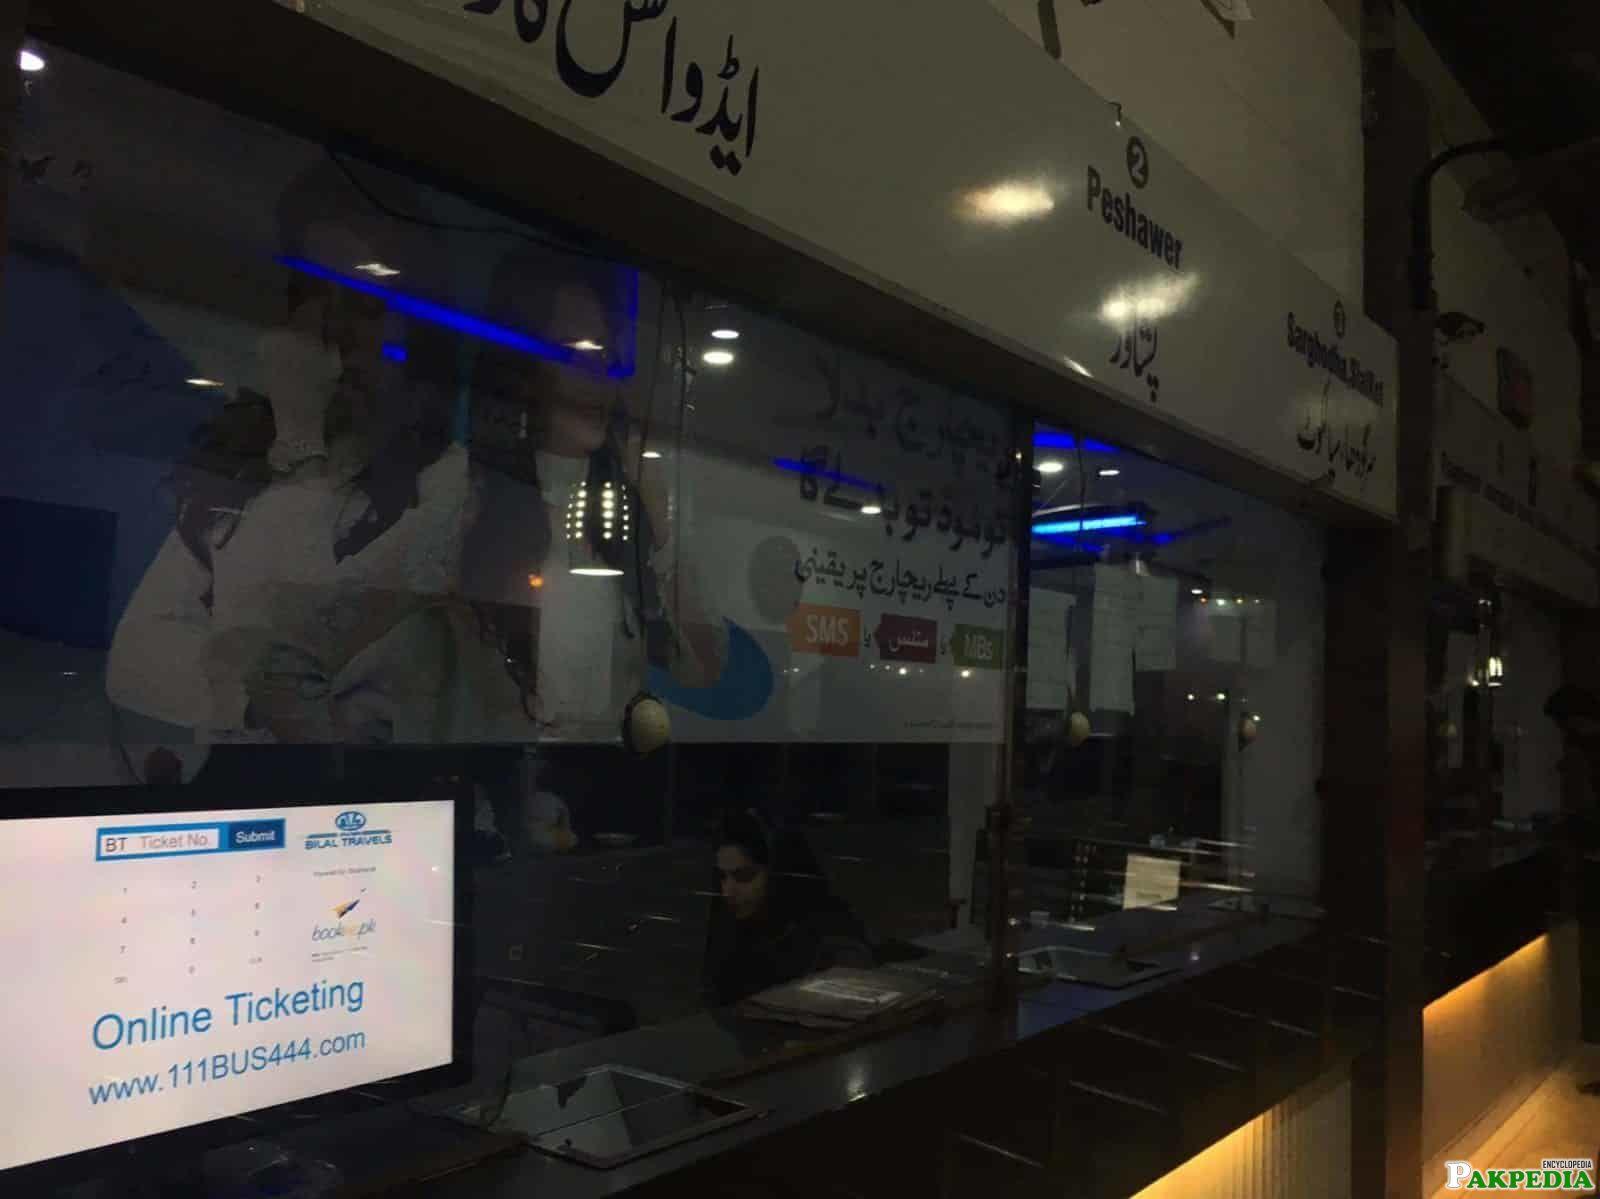 Bilal Travels online ticket booking